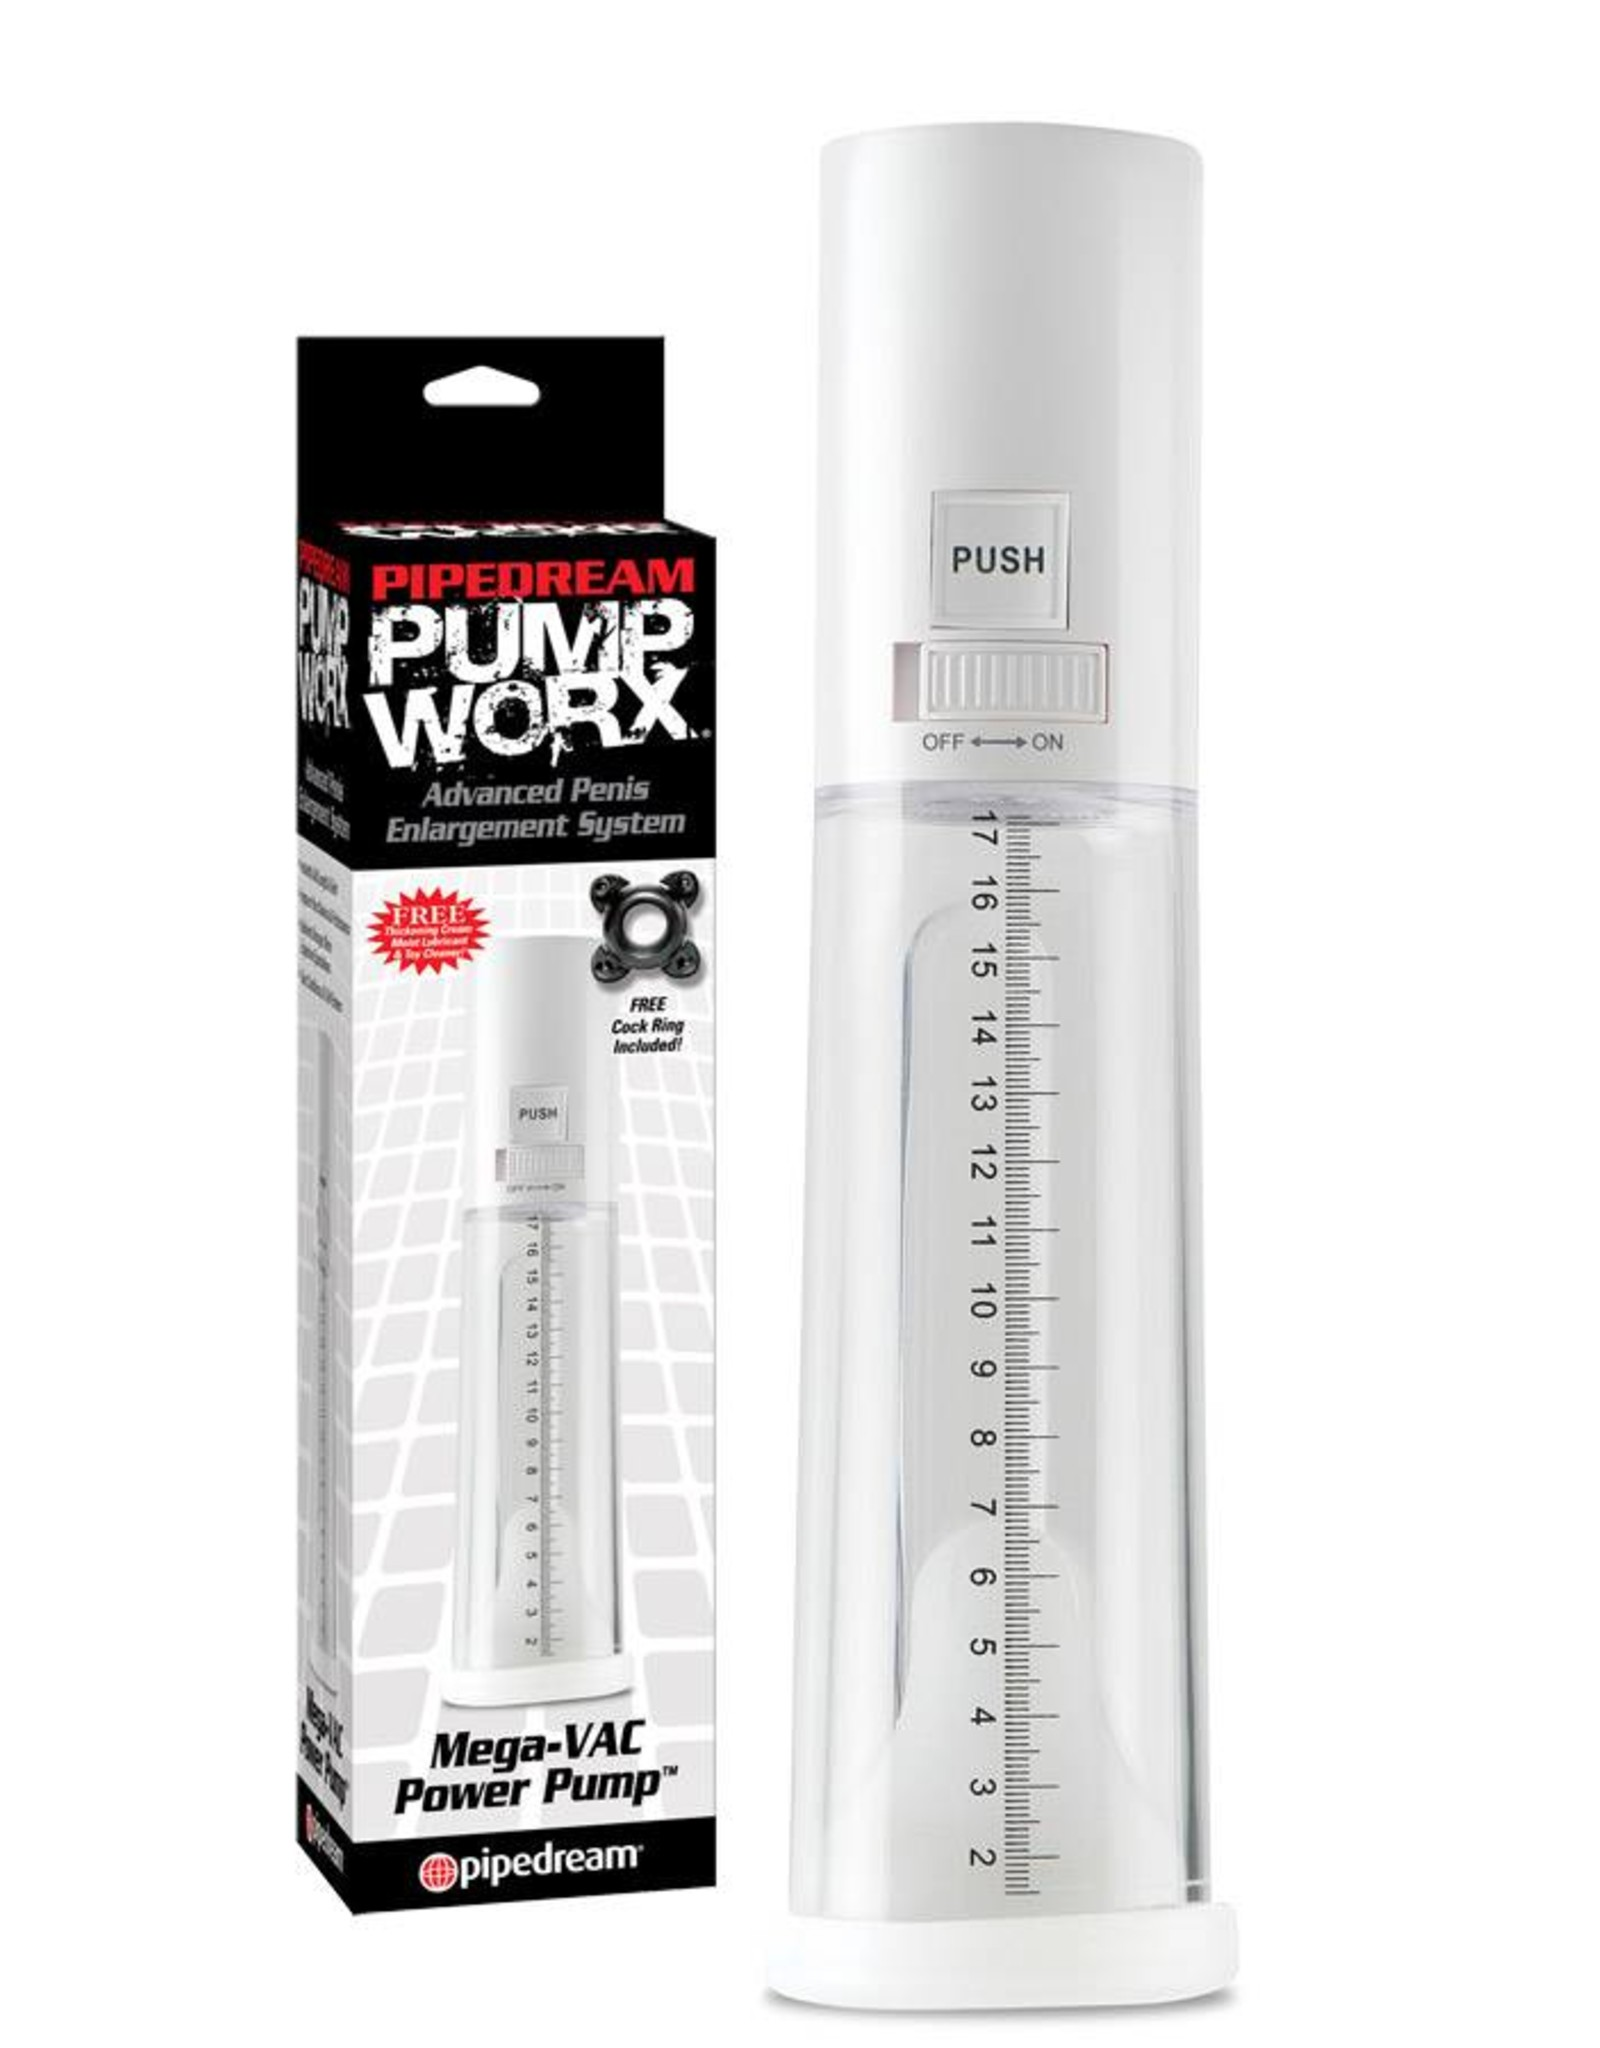 Pump Worx Mega-Vac Power pompe